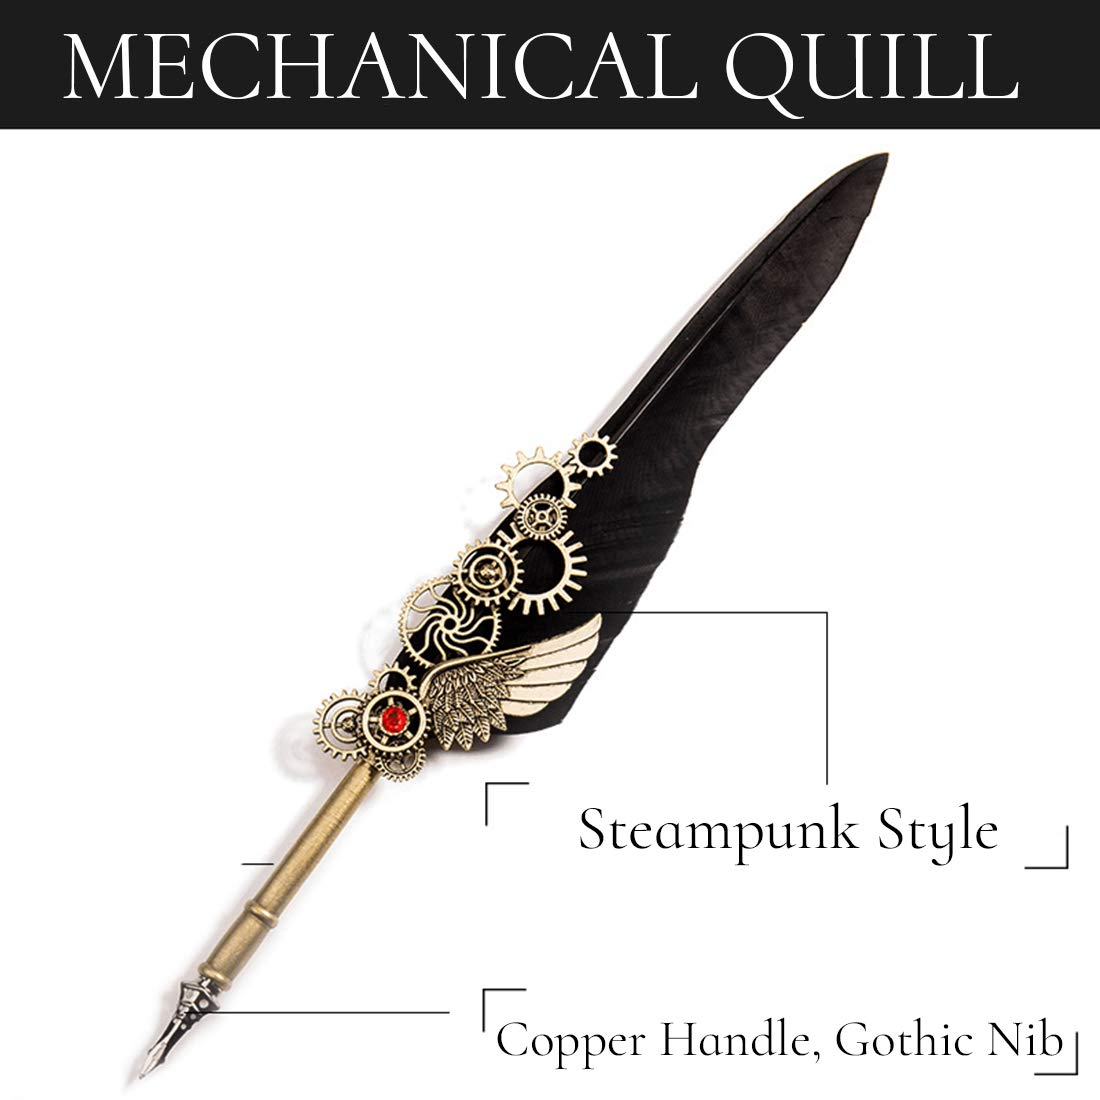 HENHEN Feather Quill Pen Set - 100% Hand Craft - Steampunk Quill Pen and Notebook Set, in Gift Box by HENHEN (Image #2)